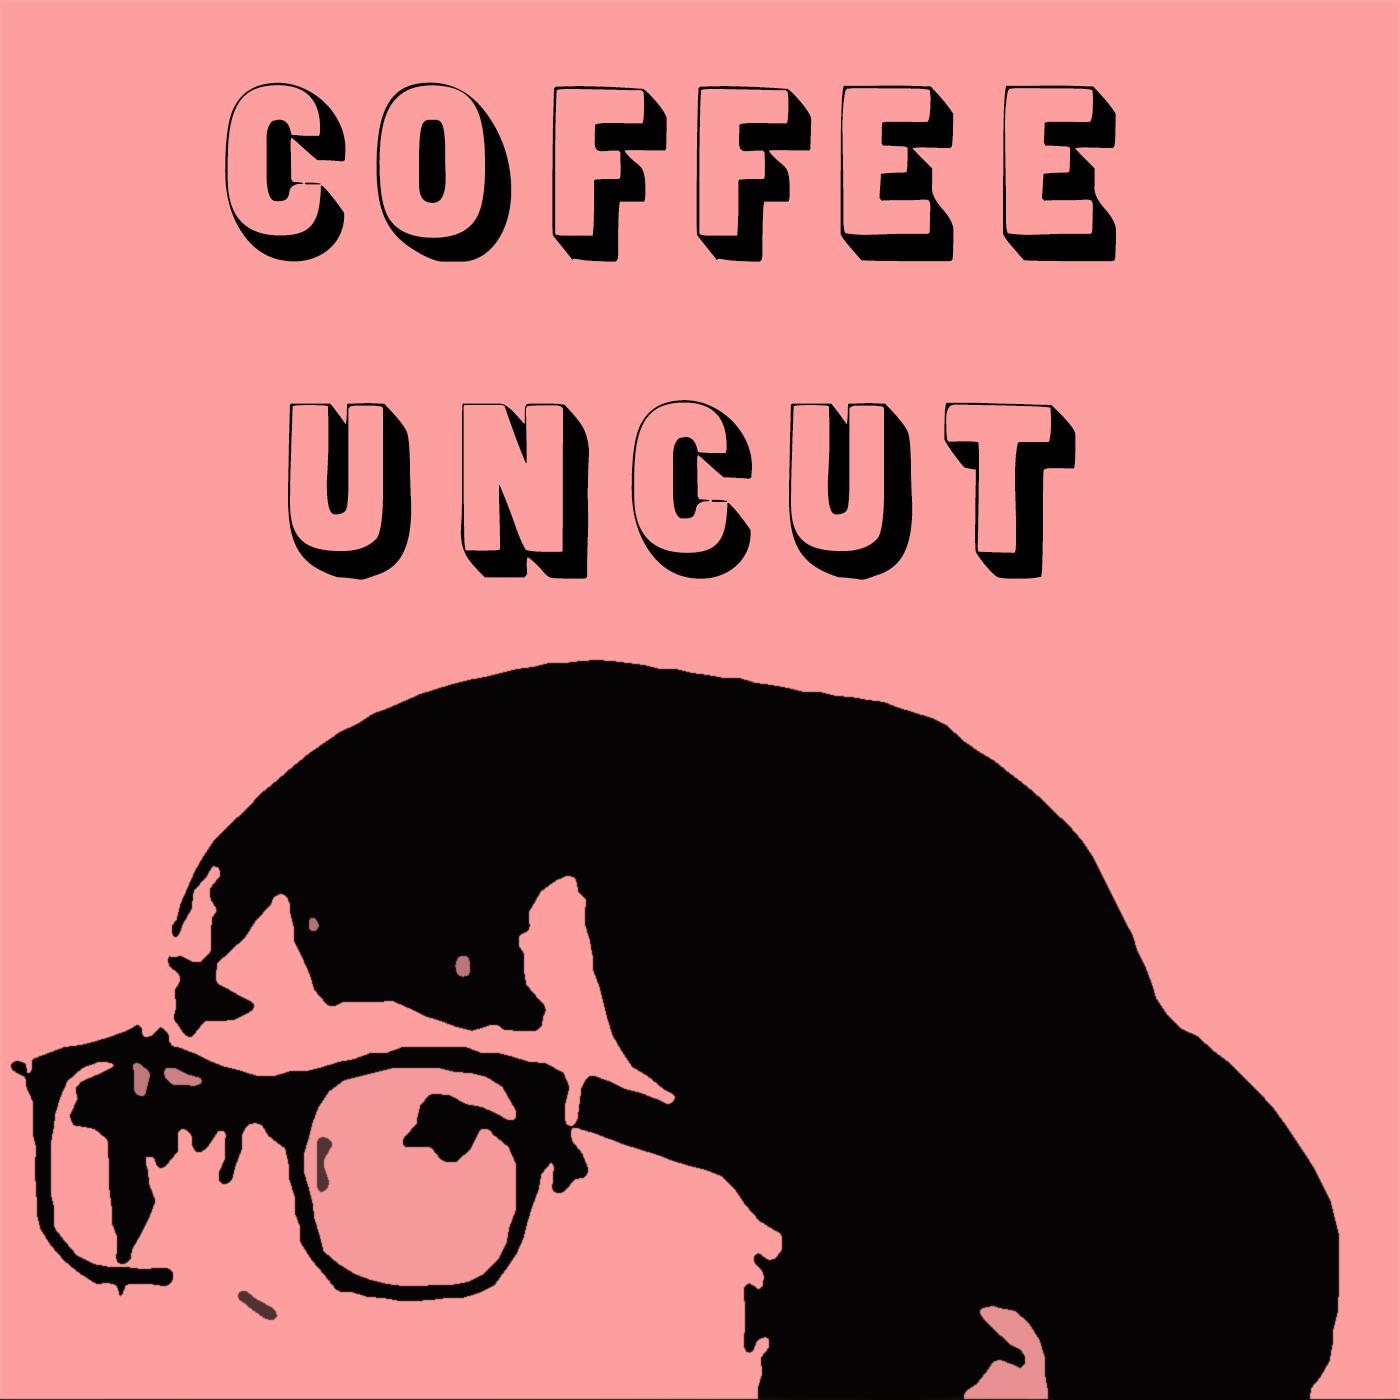 Coffee Uncut